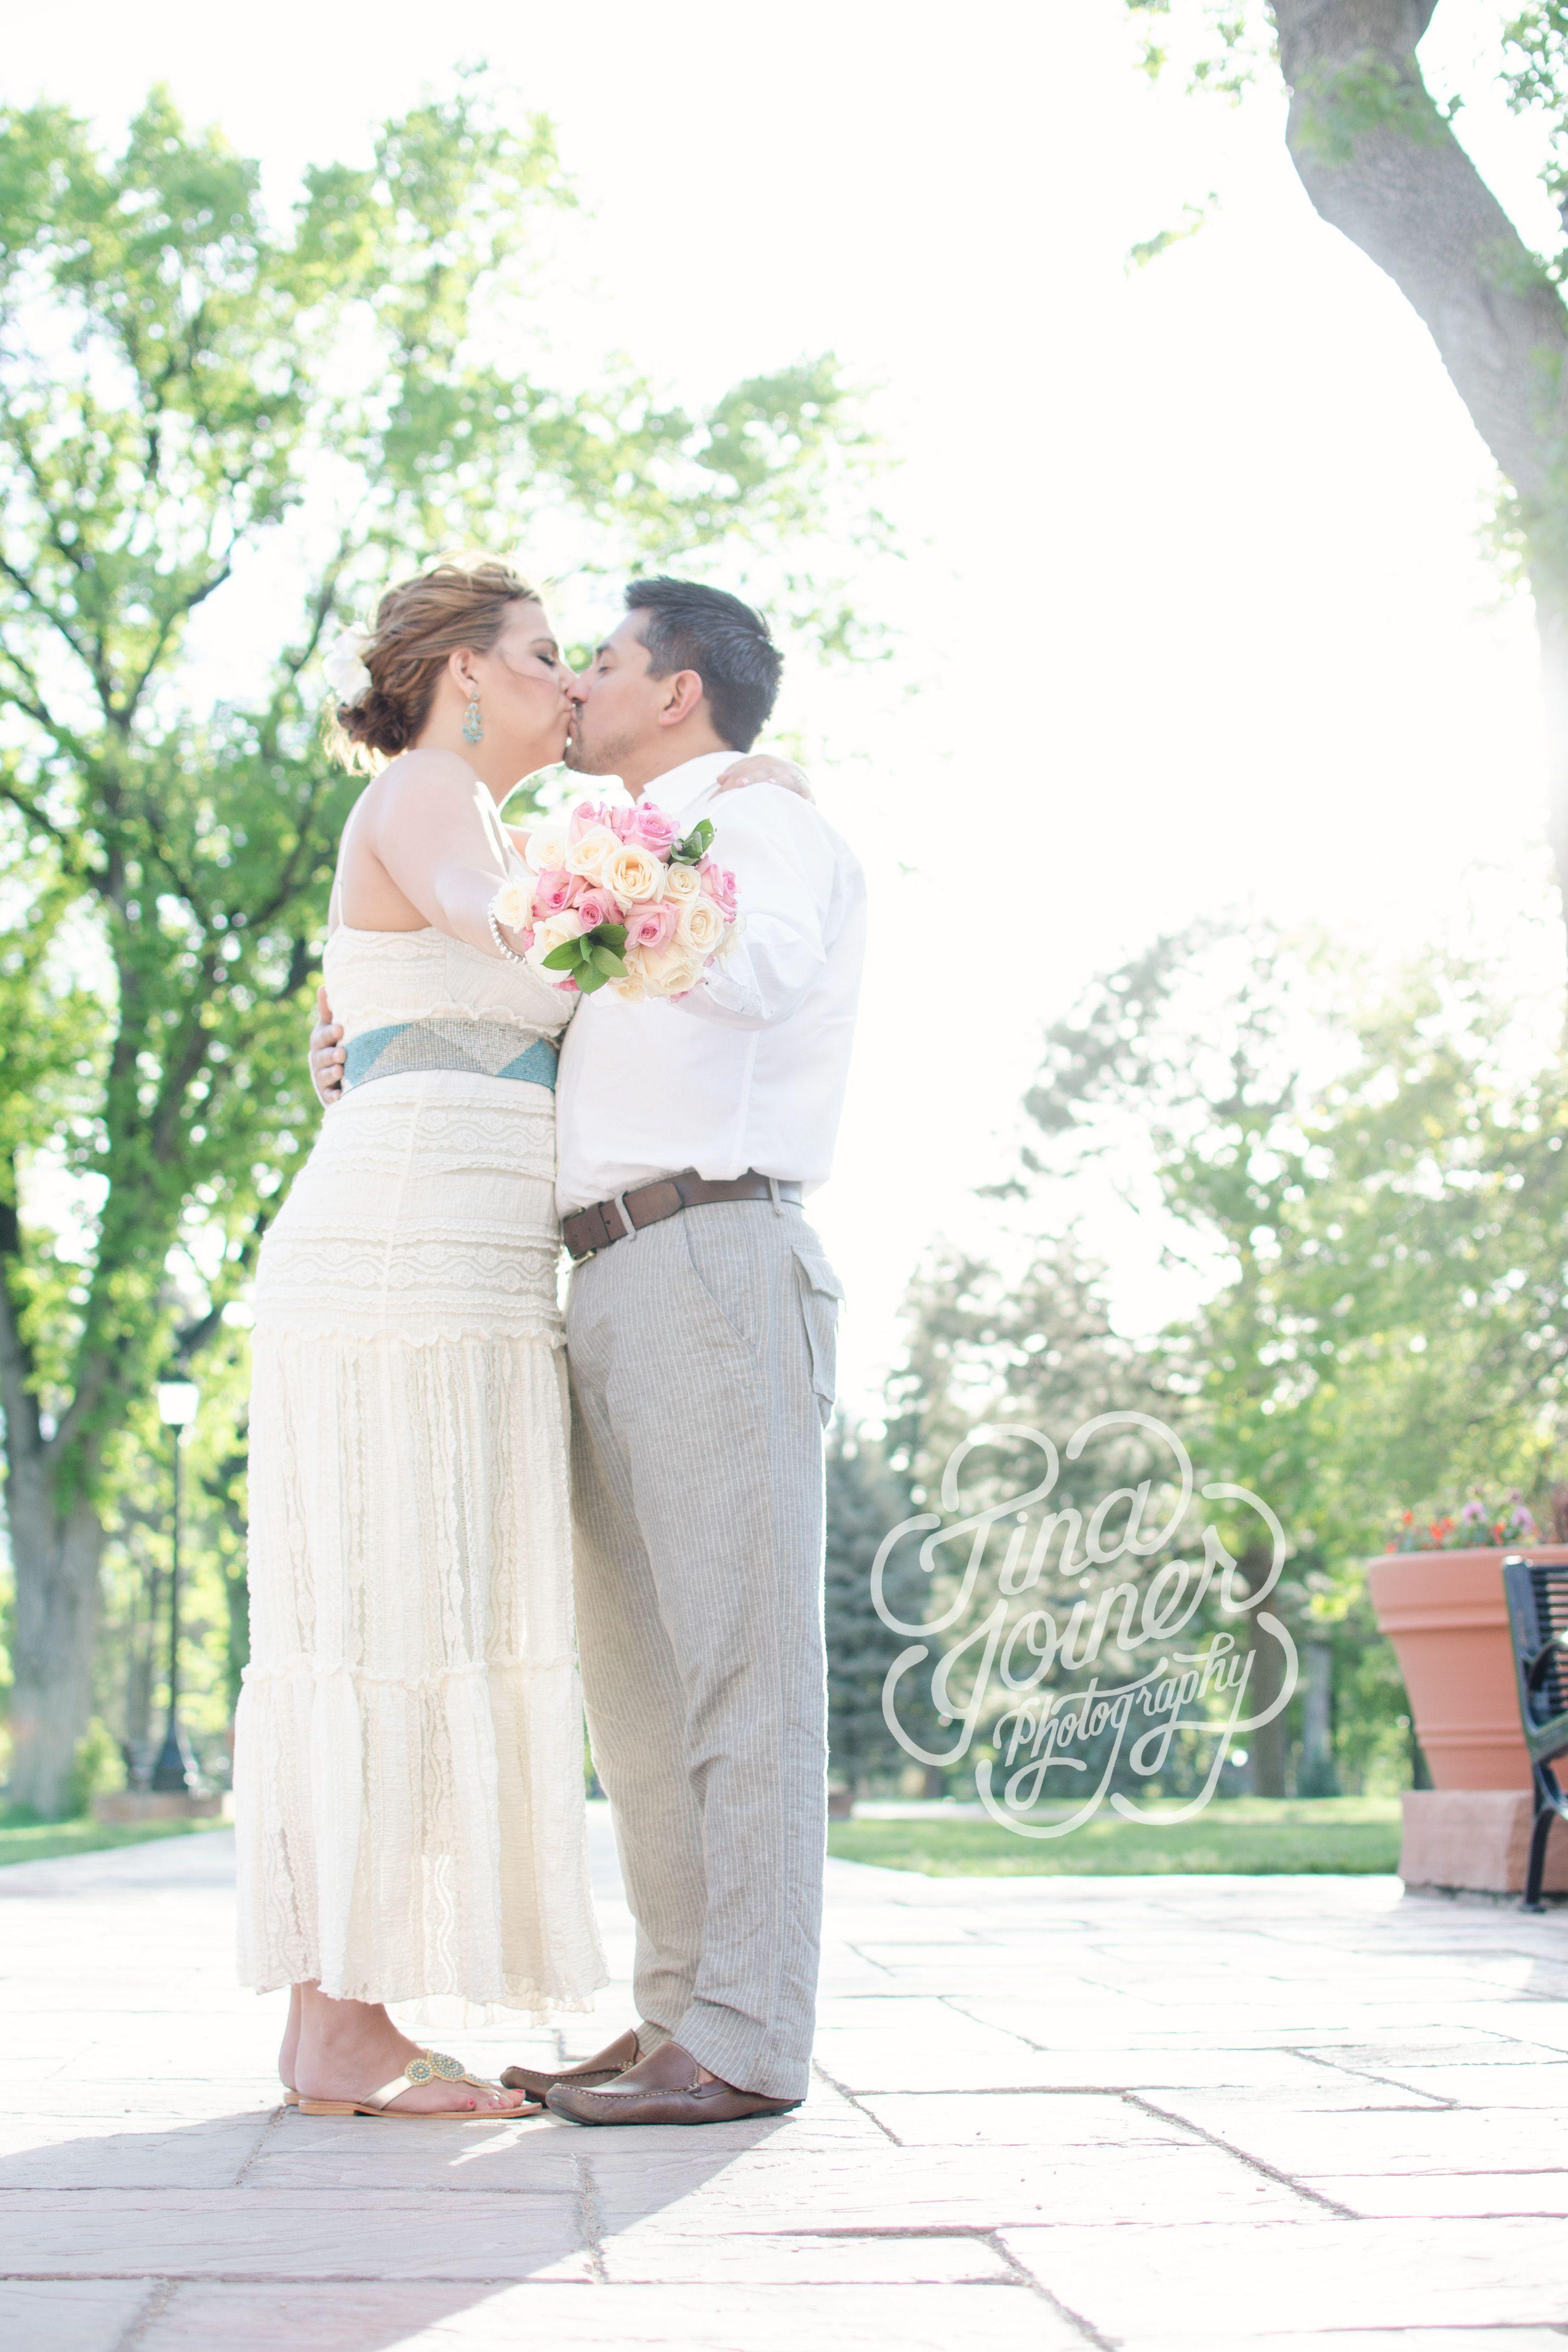 Colorado Springs Wedding Photographer, Denver Wedding